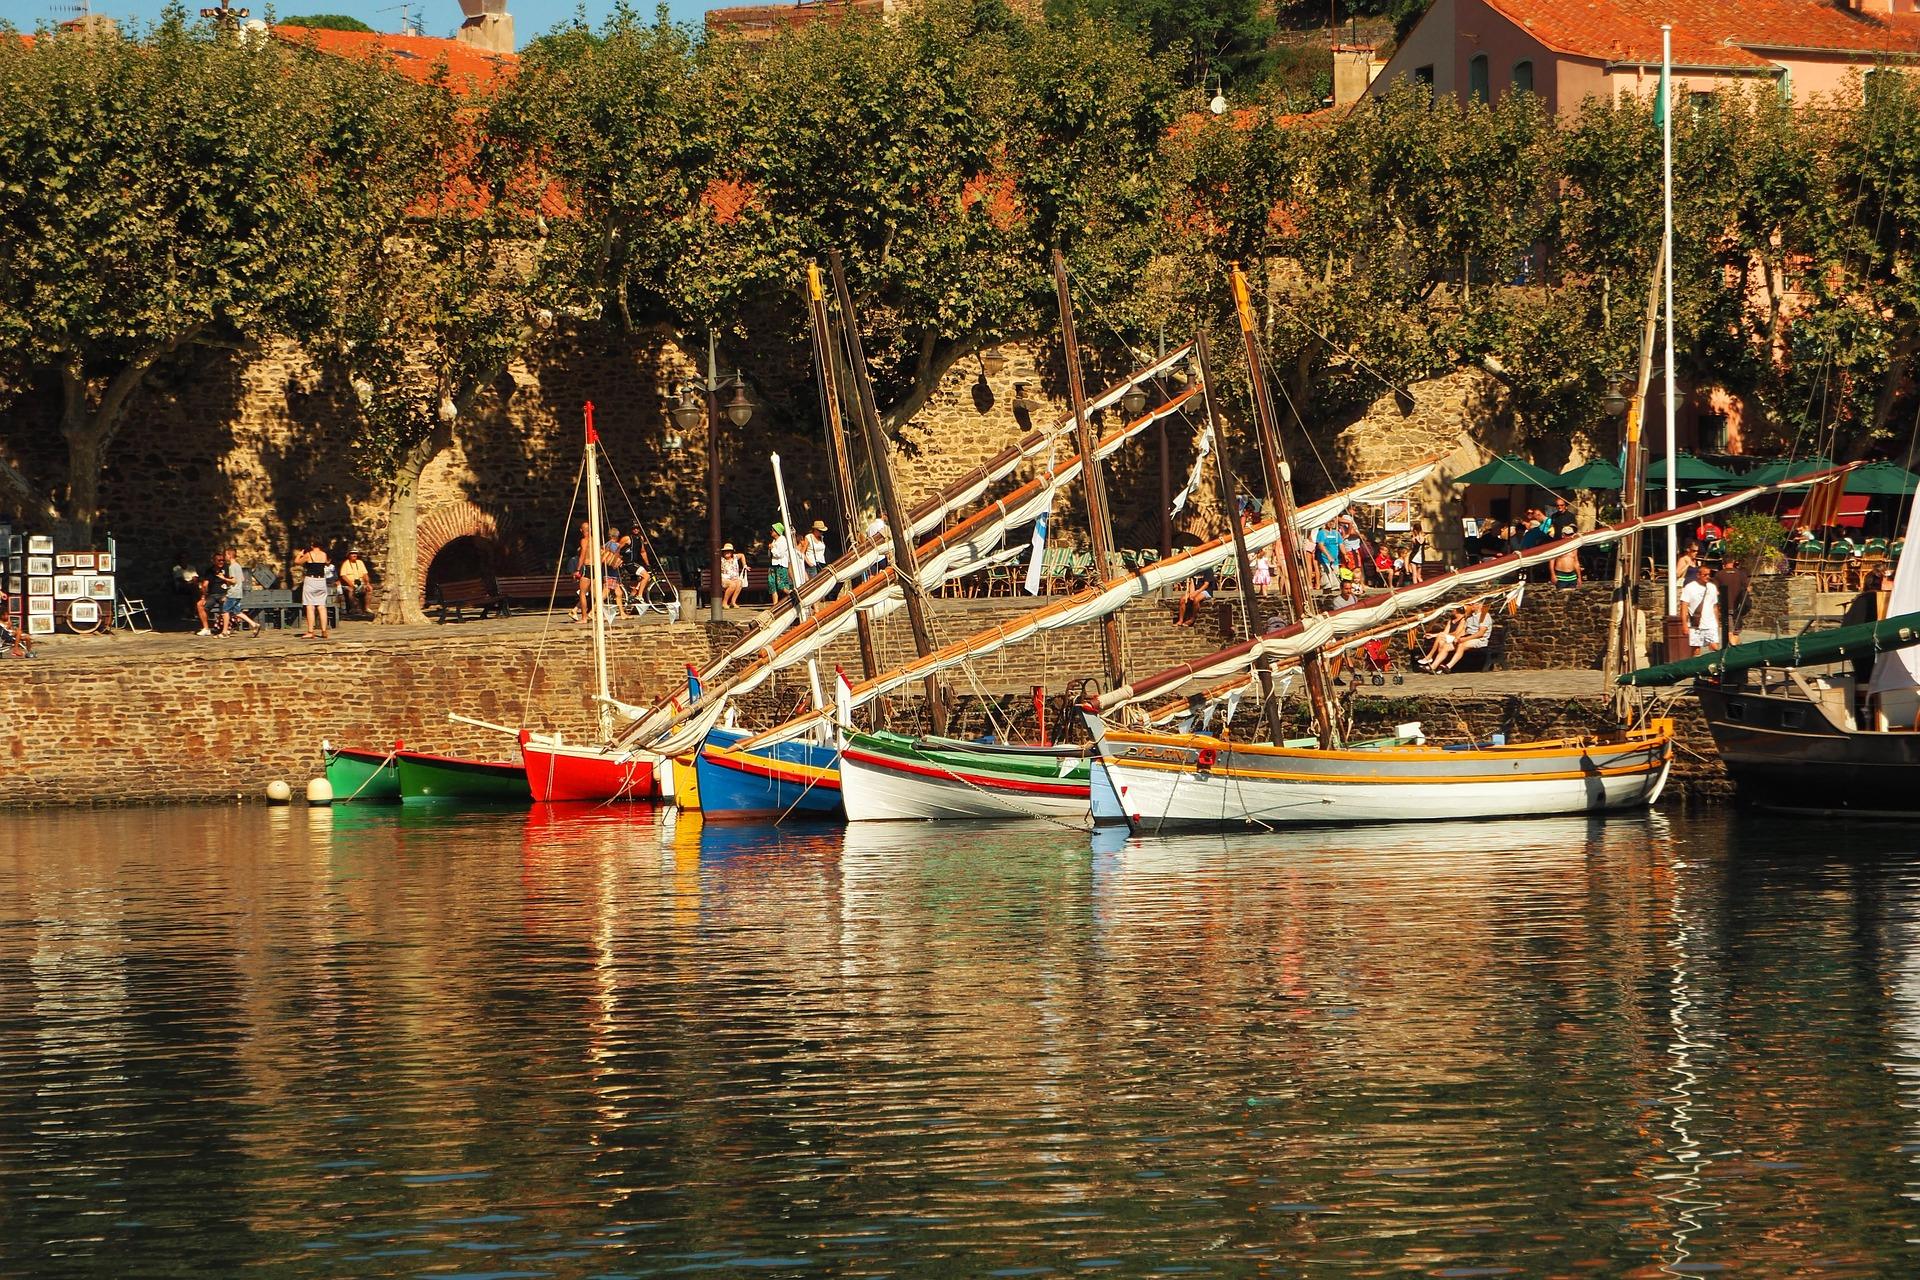 Collioure_CC0.jpg?1545126517